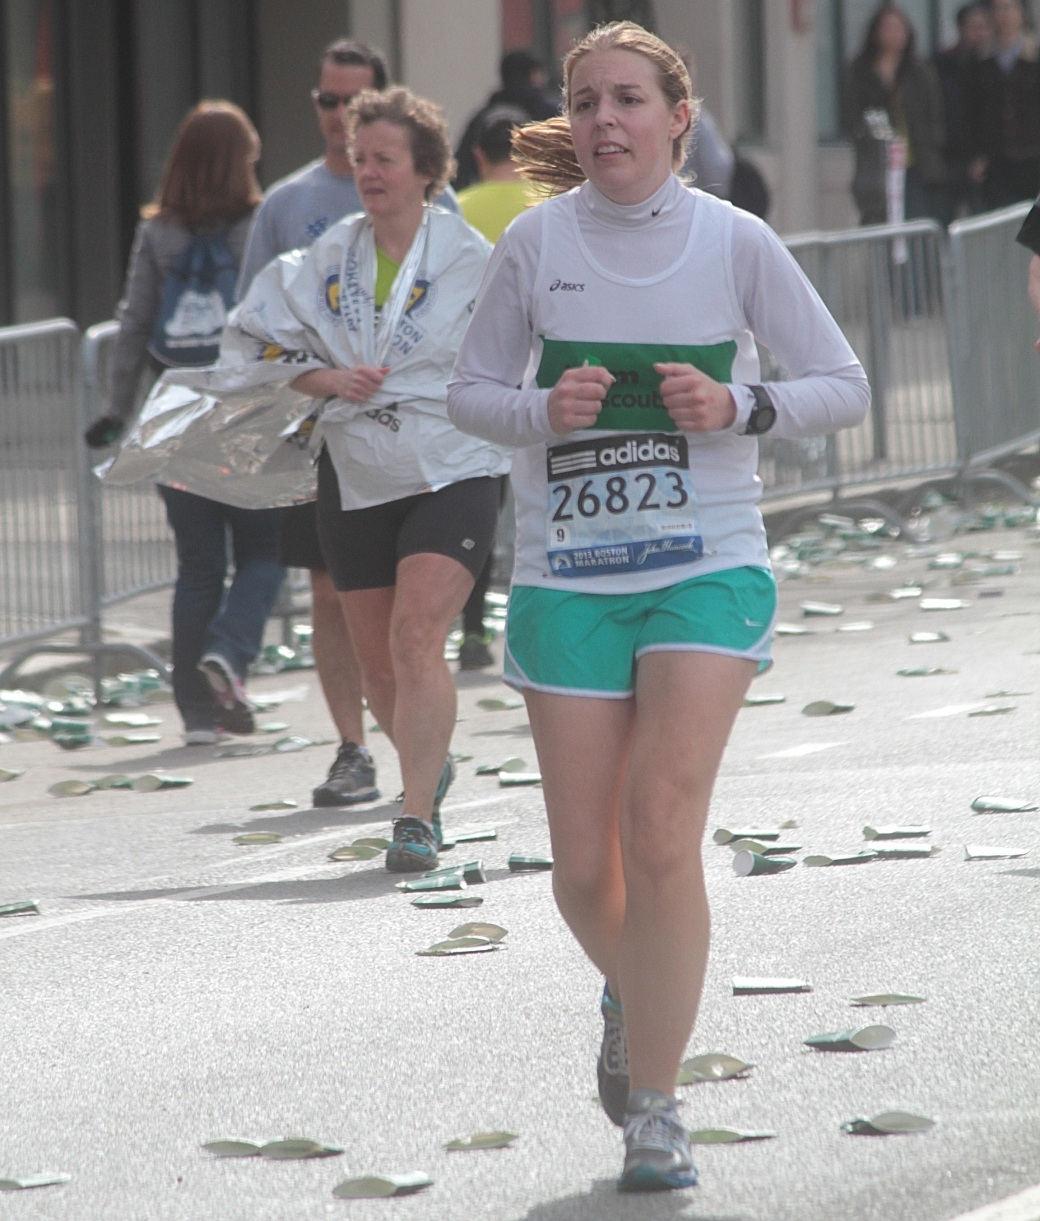 boston marathon 2013 number 26823